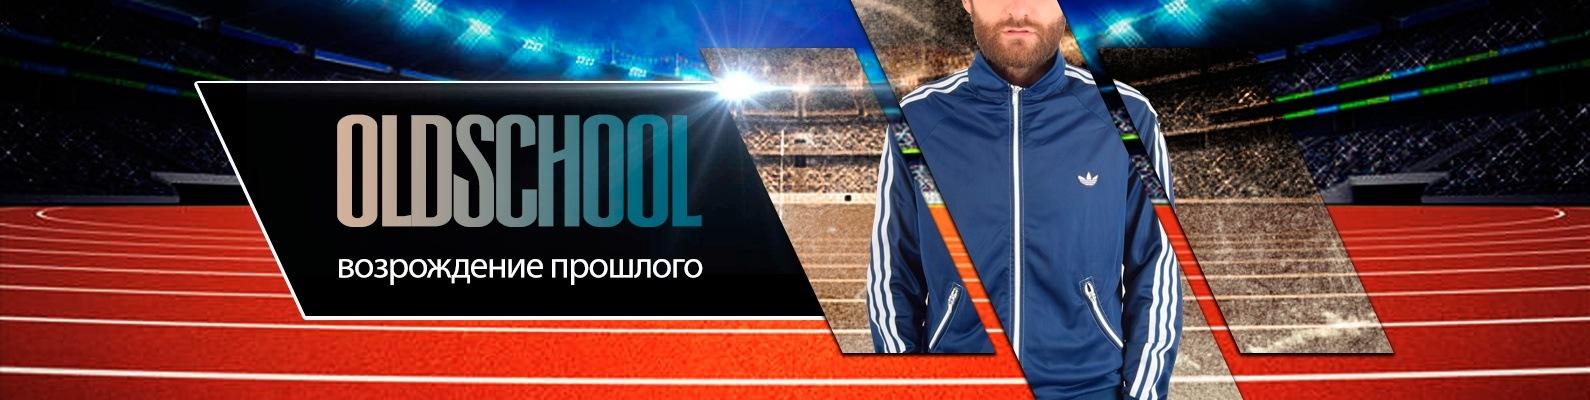 61bad7c16217 Костюмы адидас 80 90 х adidas OldSchool   ВКонтакте